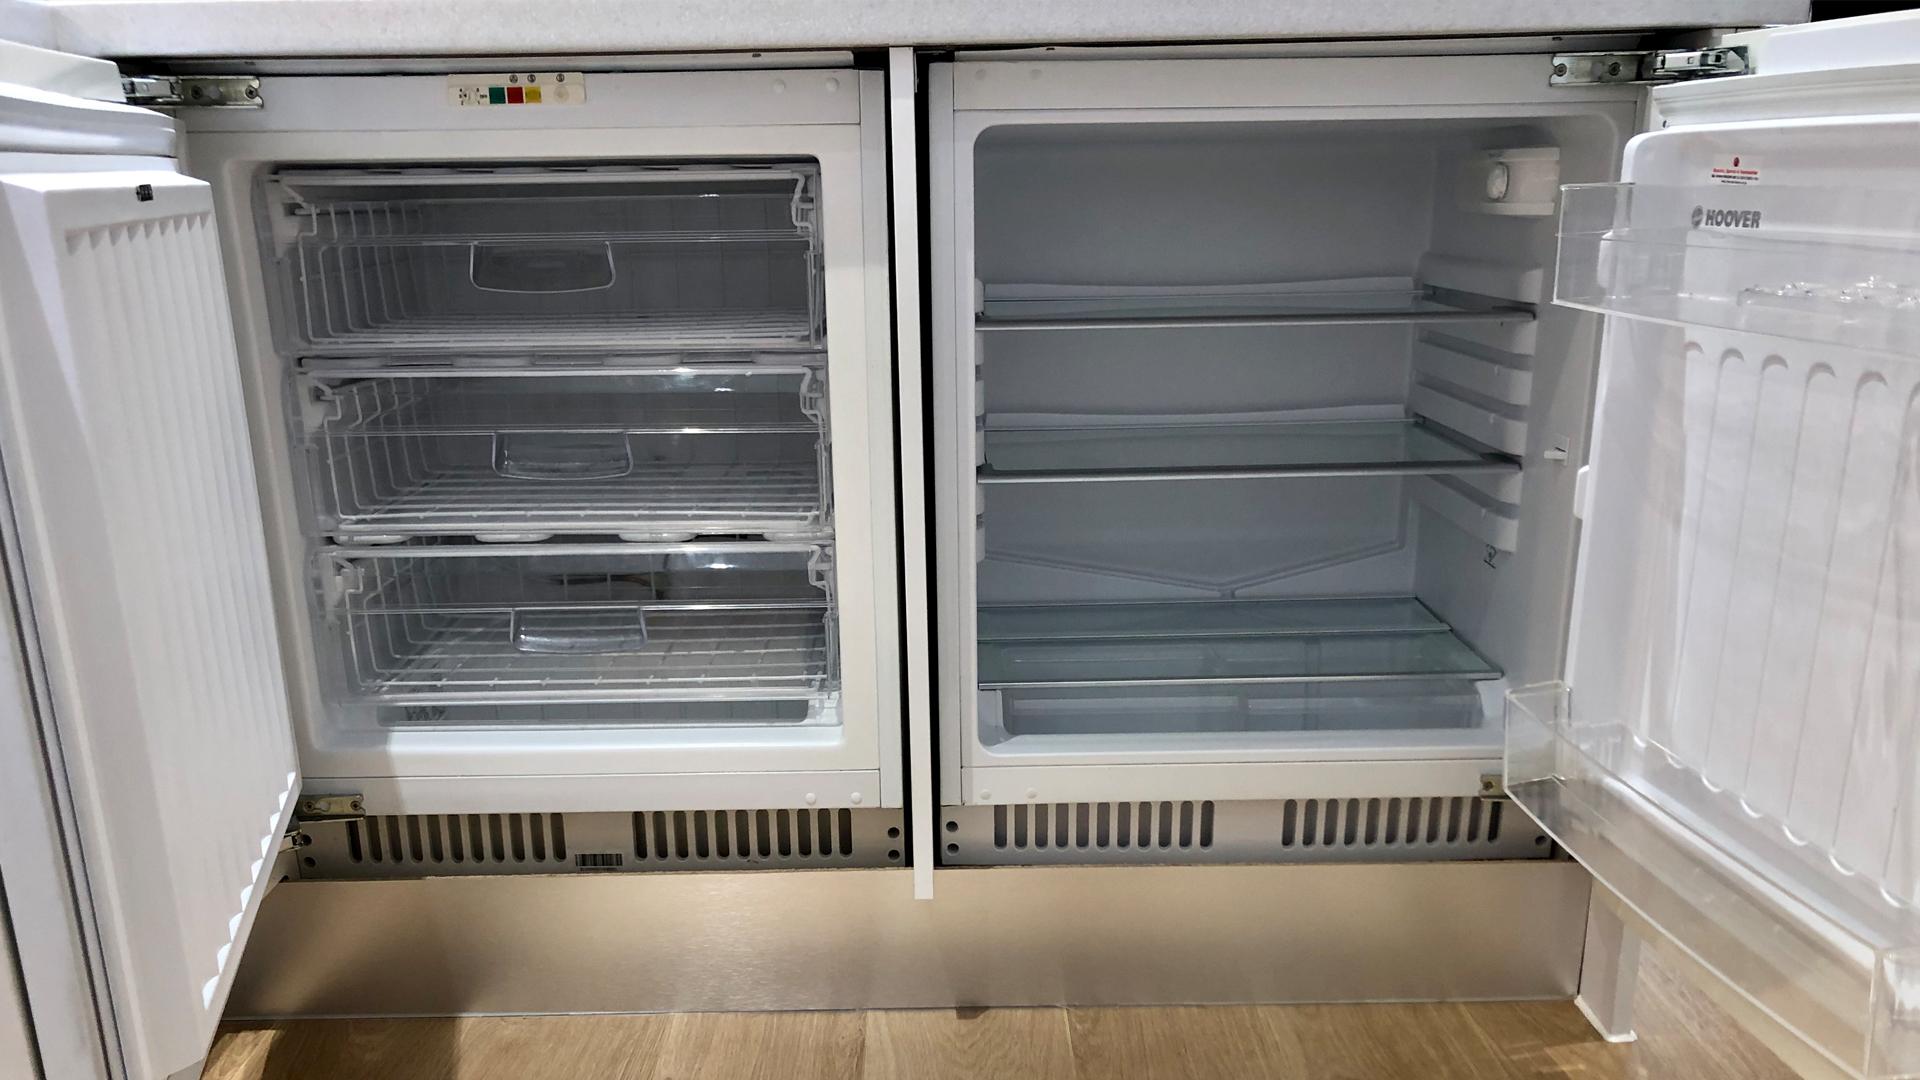 http://www.corepropertysolutions.co.uk/wp-content/uploads/2019/06/kitchen4.jpg